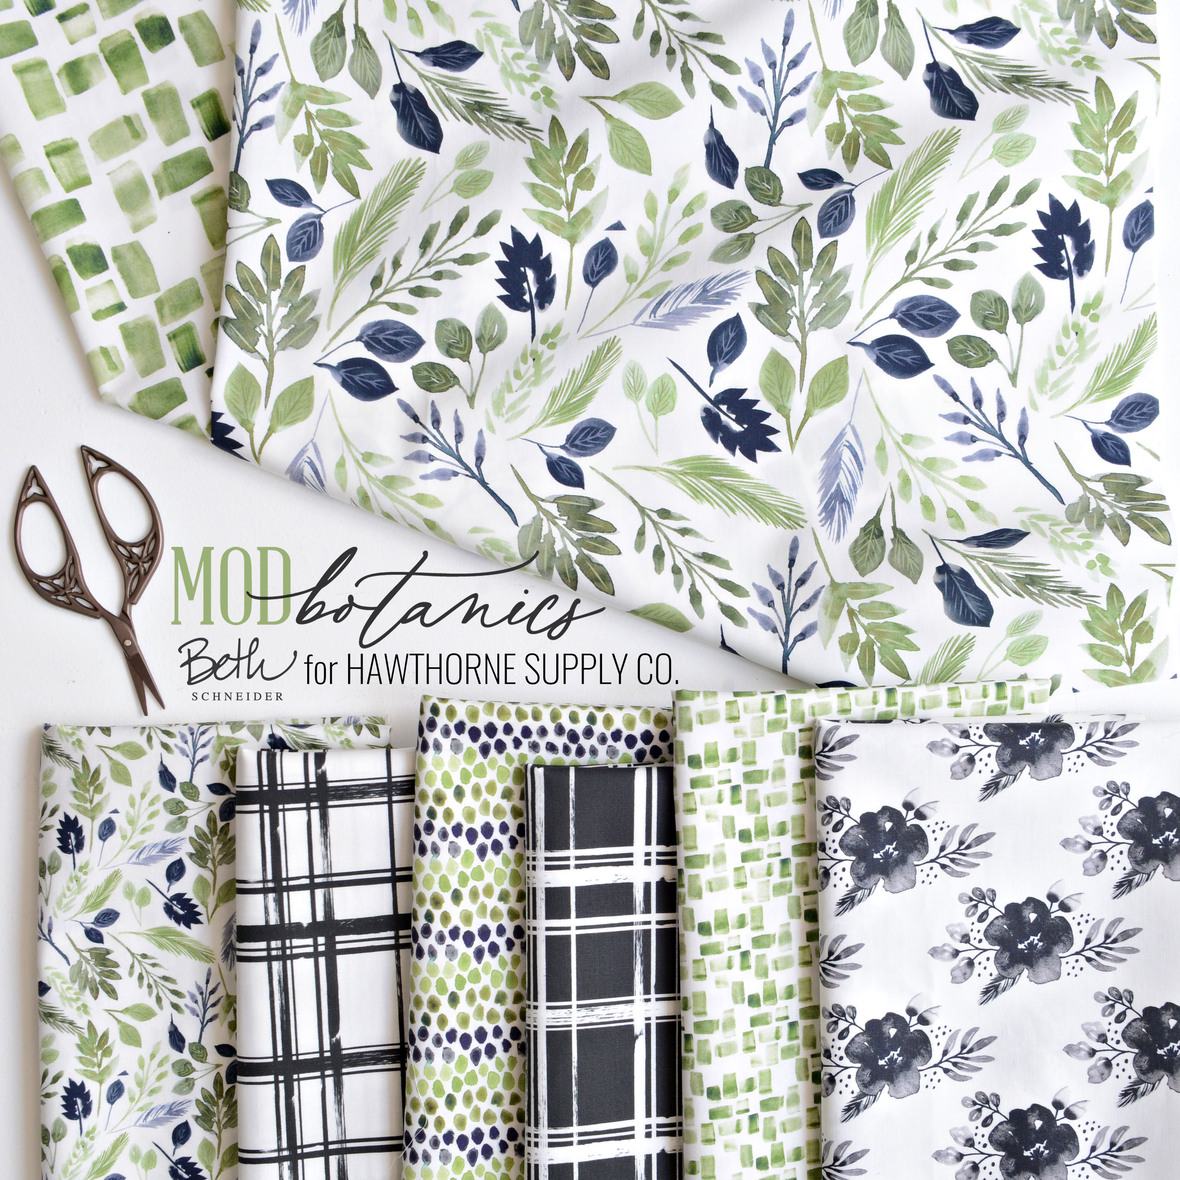 Mod Botanics Fabric Poster Beth Schneider Designs for Hawthorne Supply Co